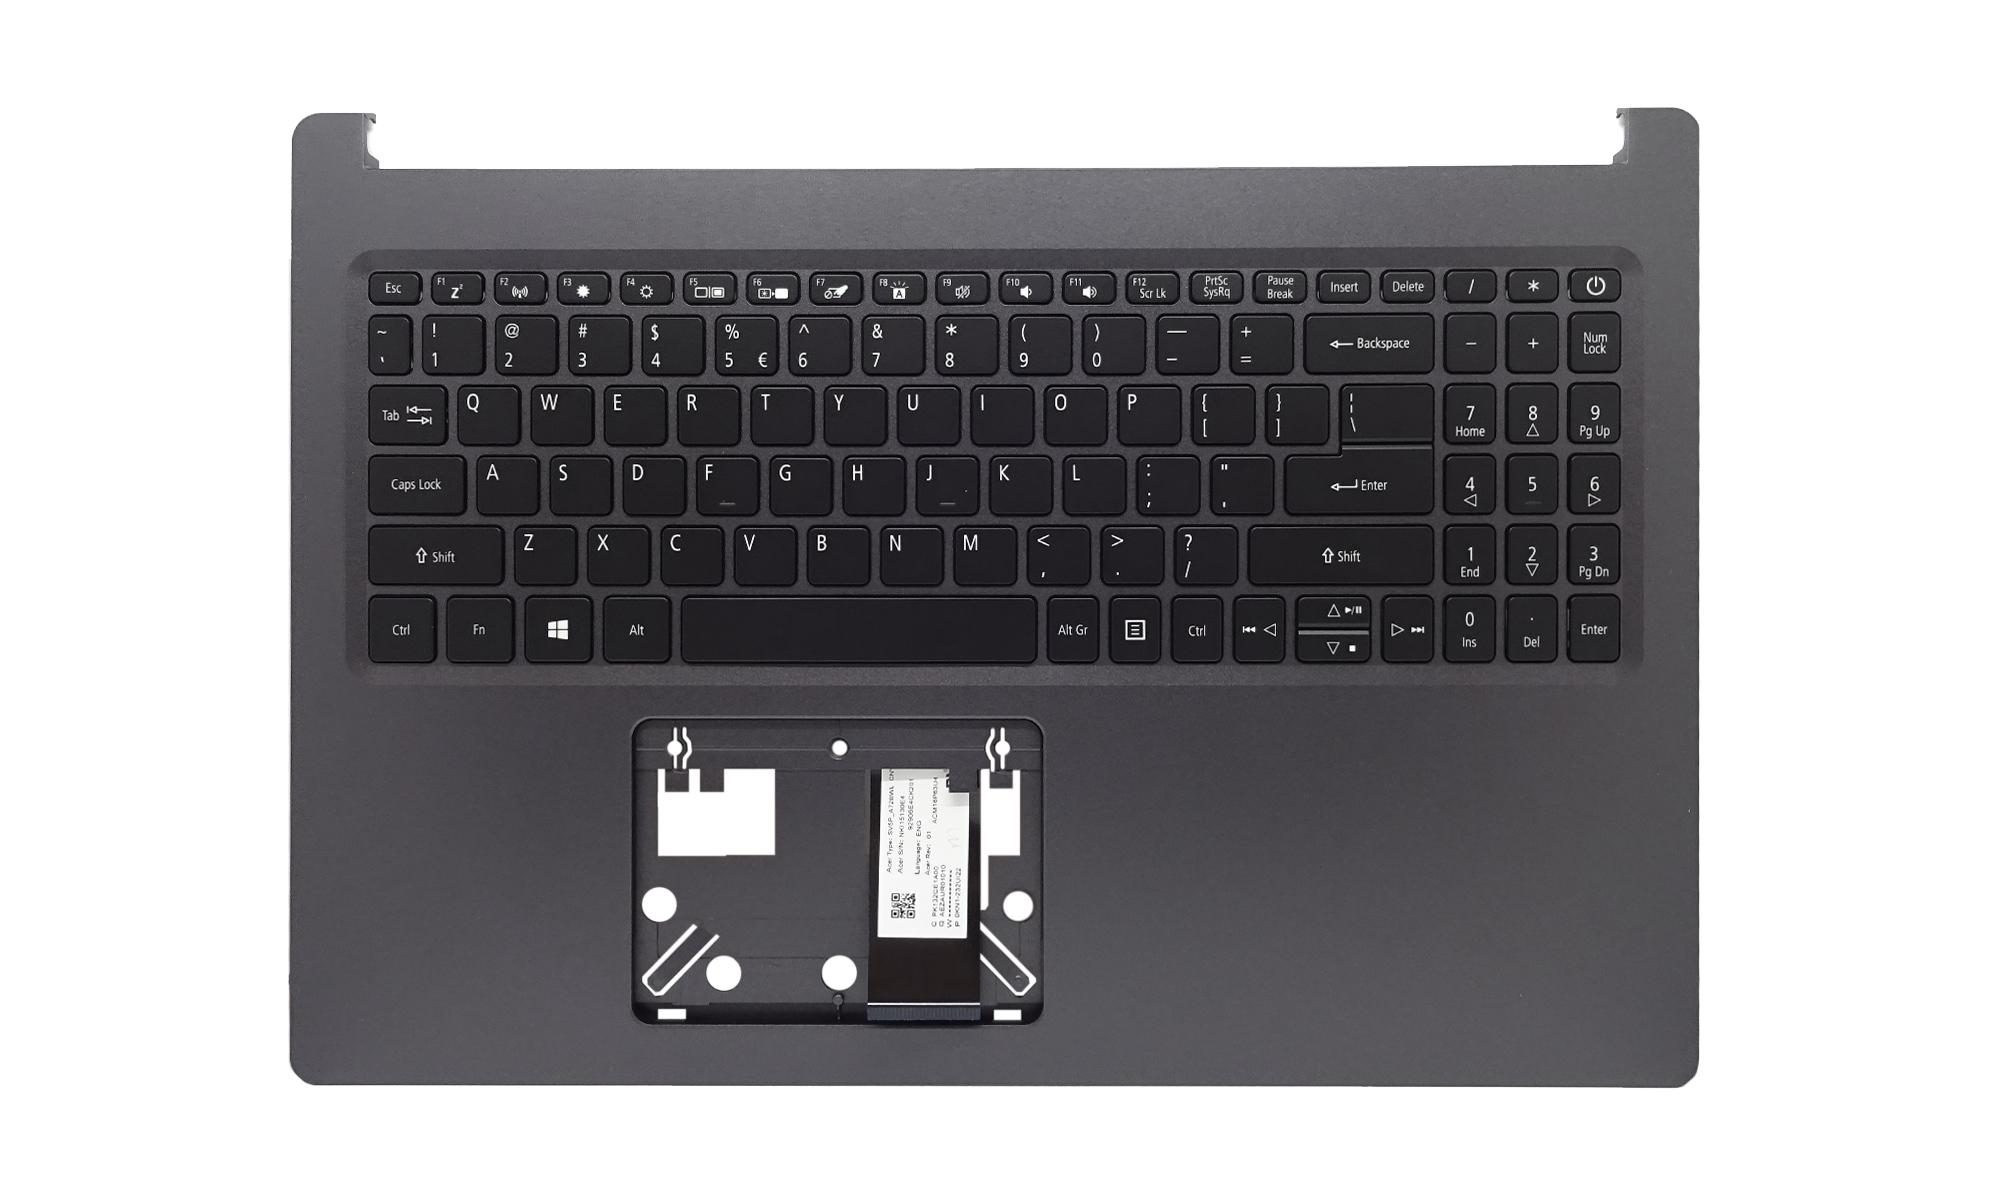 Carcasa superioara si tastatura originala Acer Aspire 5 A515-54, A515-54G, cu iluminare, layout US